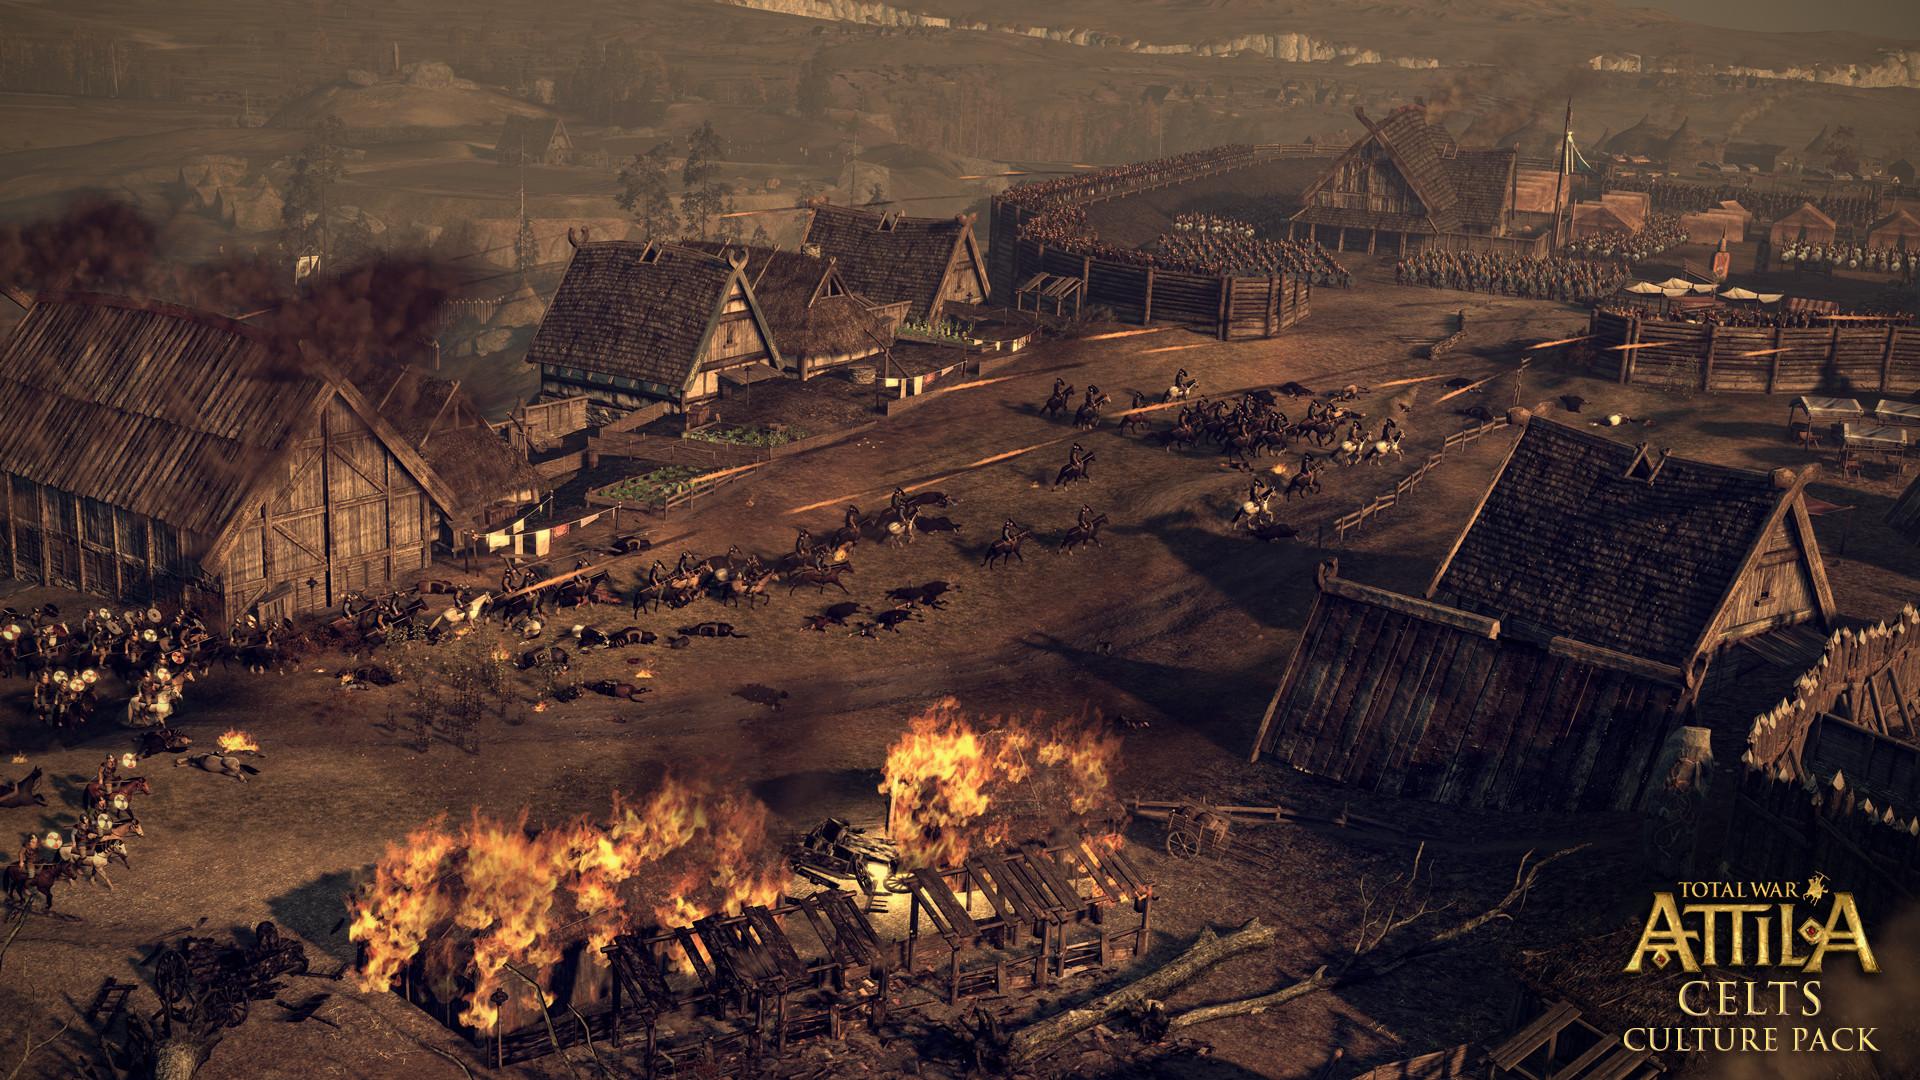 Total War: ATTILA - Celts Culture Pack PC Key Fiyatları